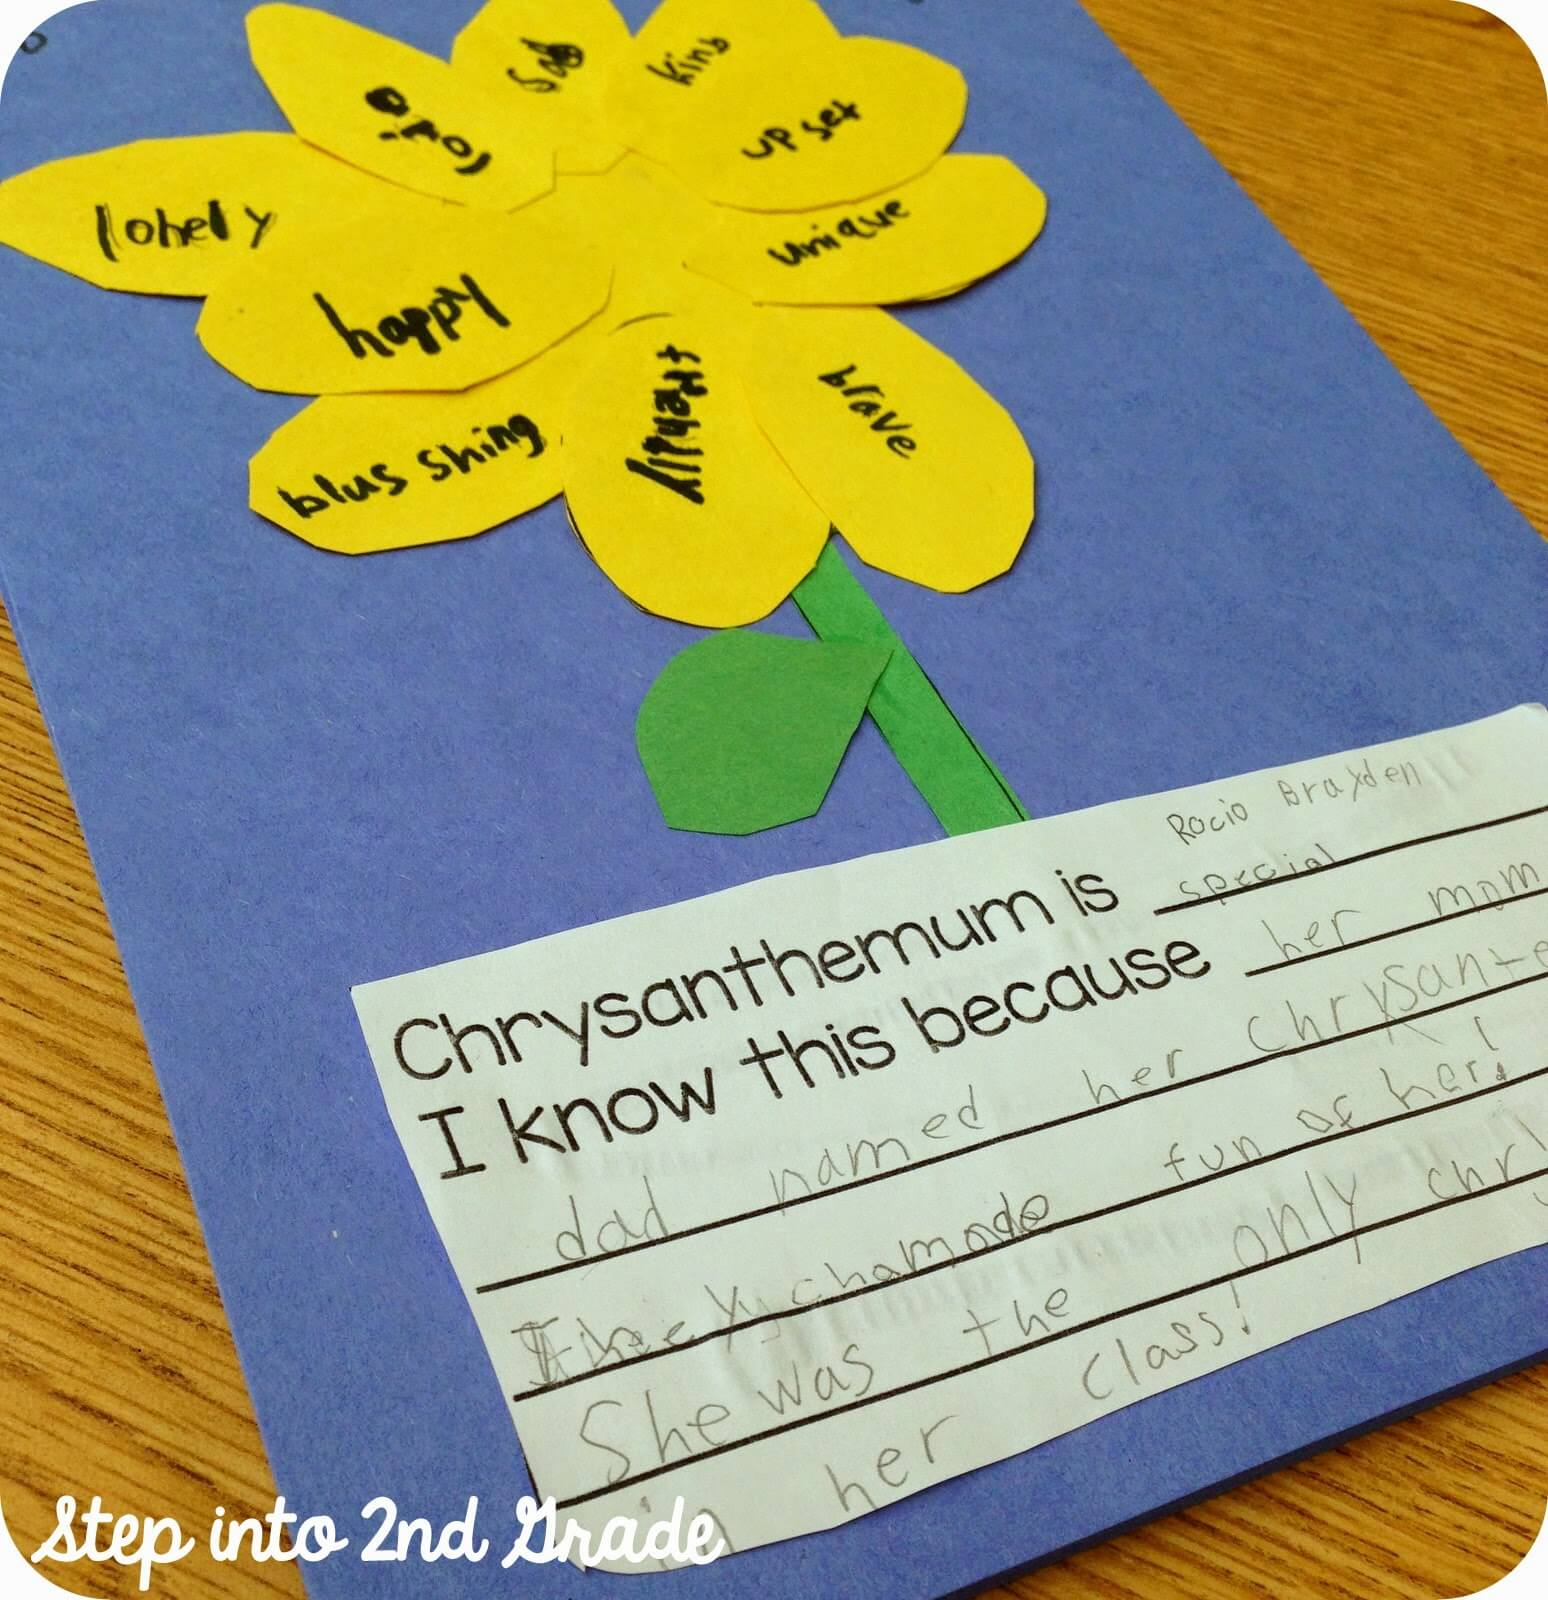 Chrysanthemum Chrysanthemum Chrysanthemum